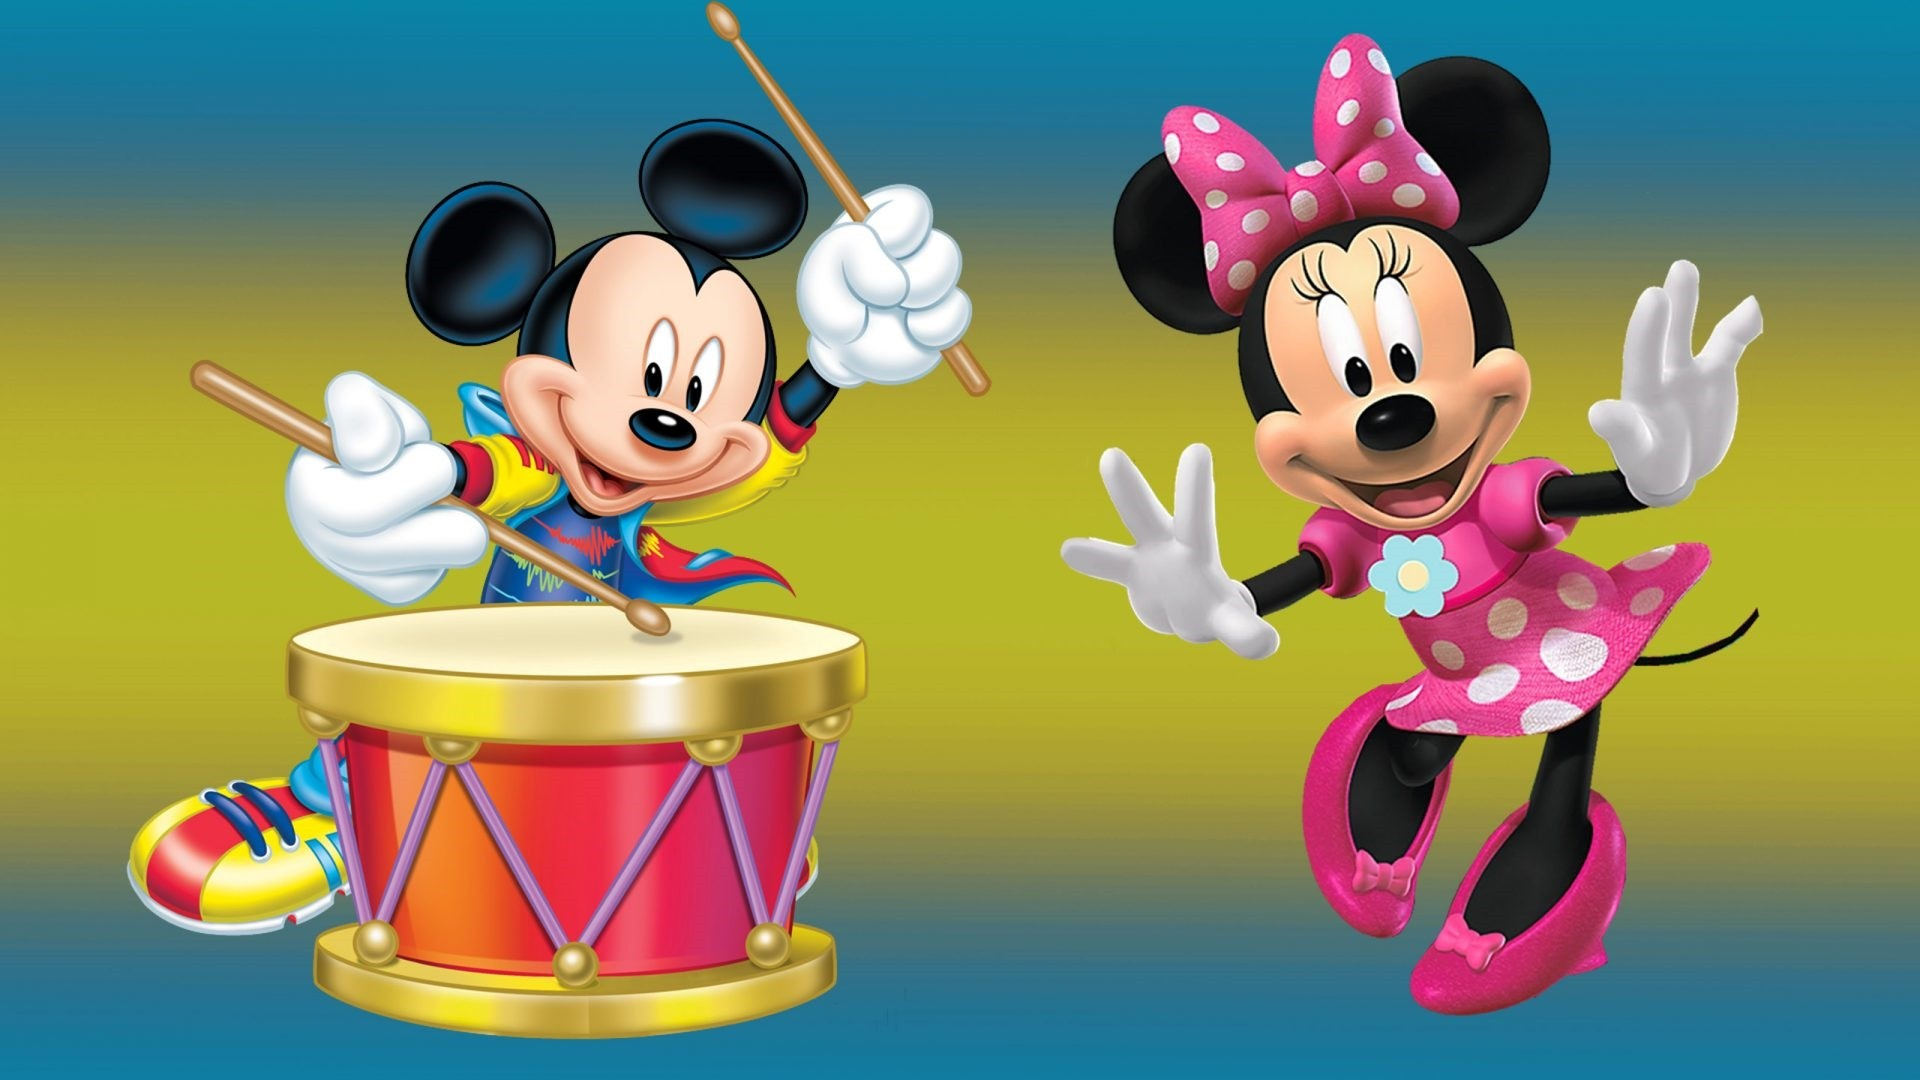 Minnie Mouse Desktop Wallpaper